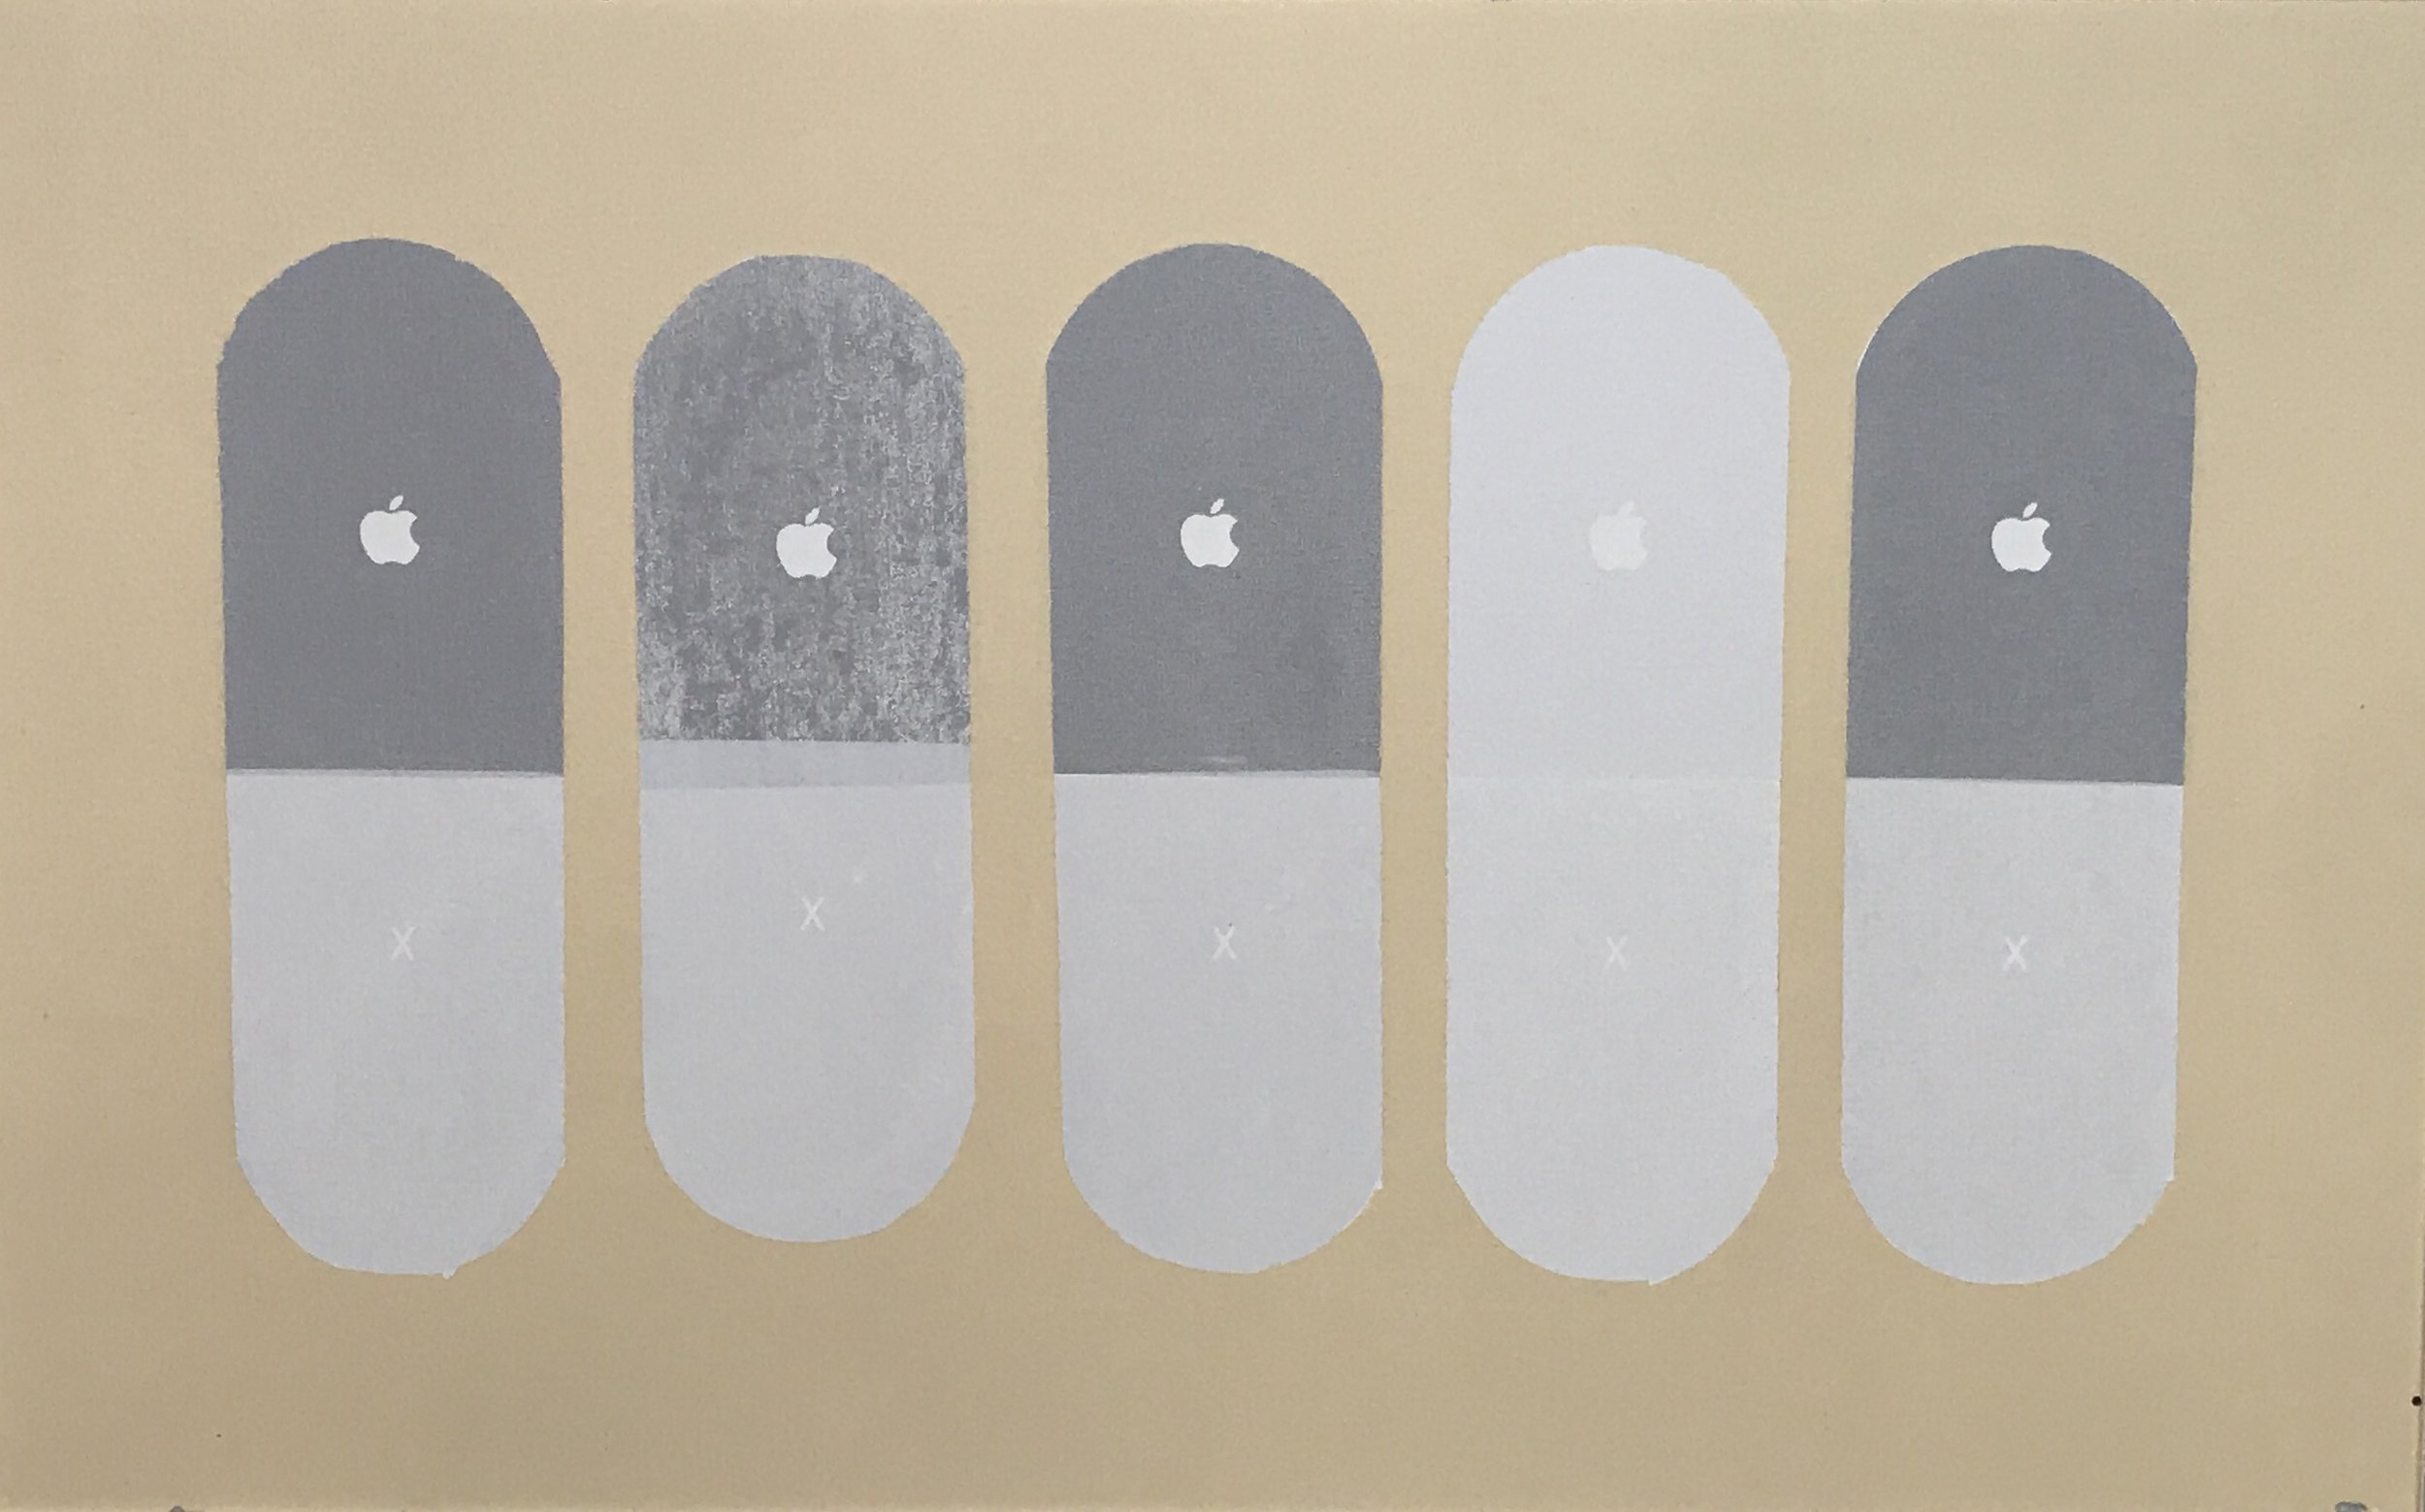 upgrade 1/1 - 36 x 22.5 Acrylic on Canvas, Nov '17Buyer Inquiry